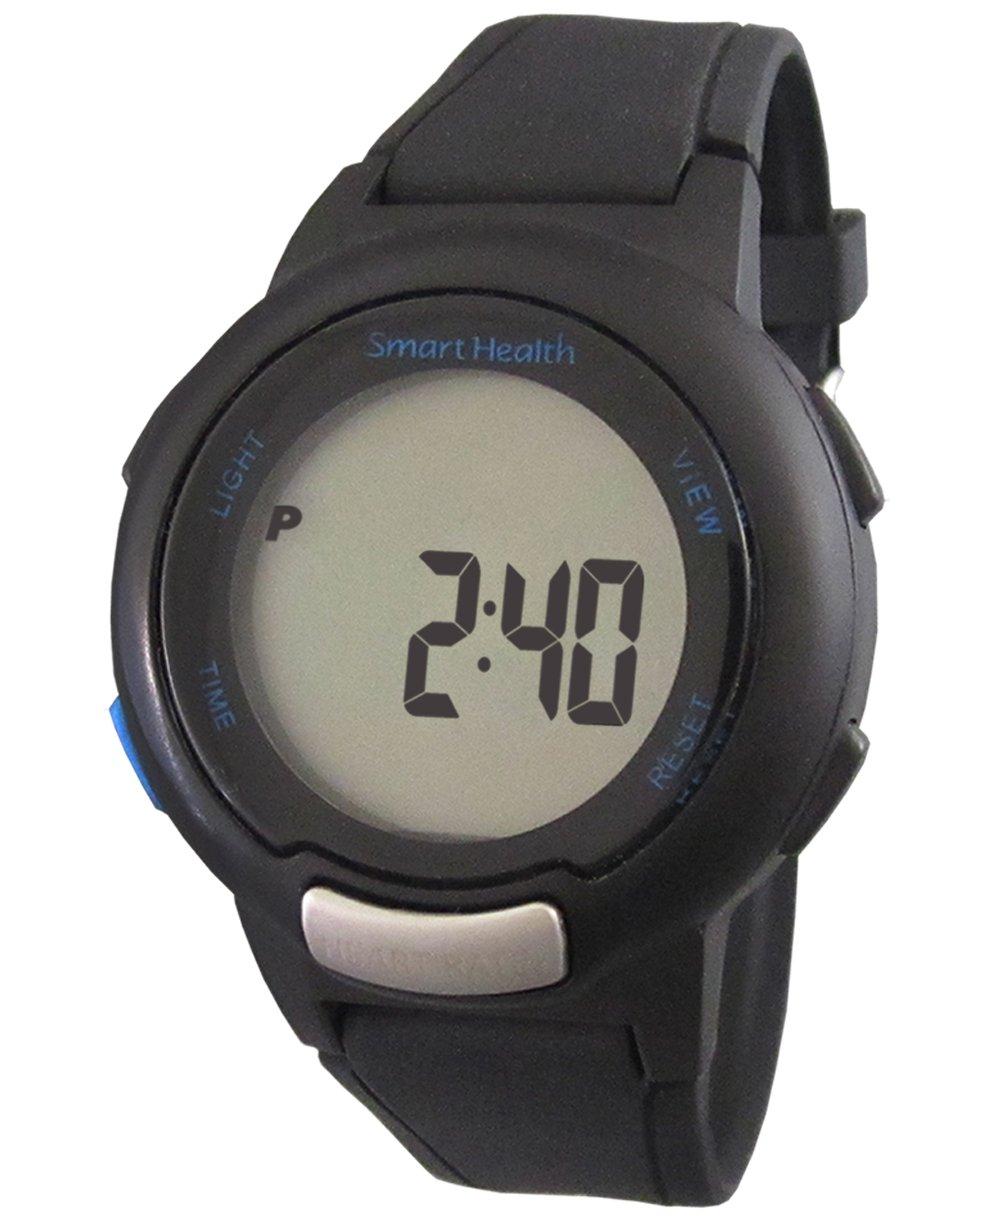 Smarthealth Walking Fit Activity Tracker - Black - Large